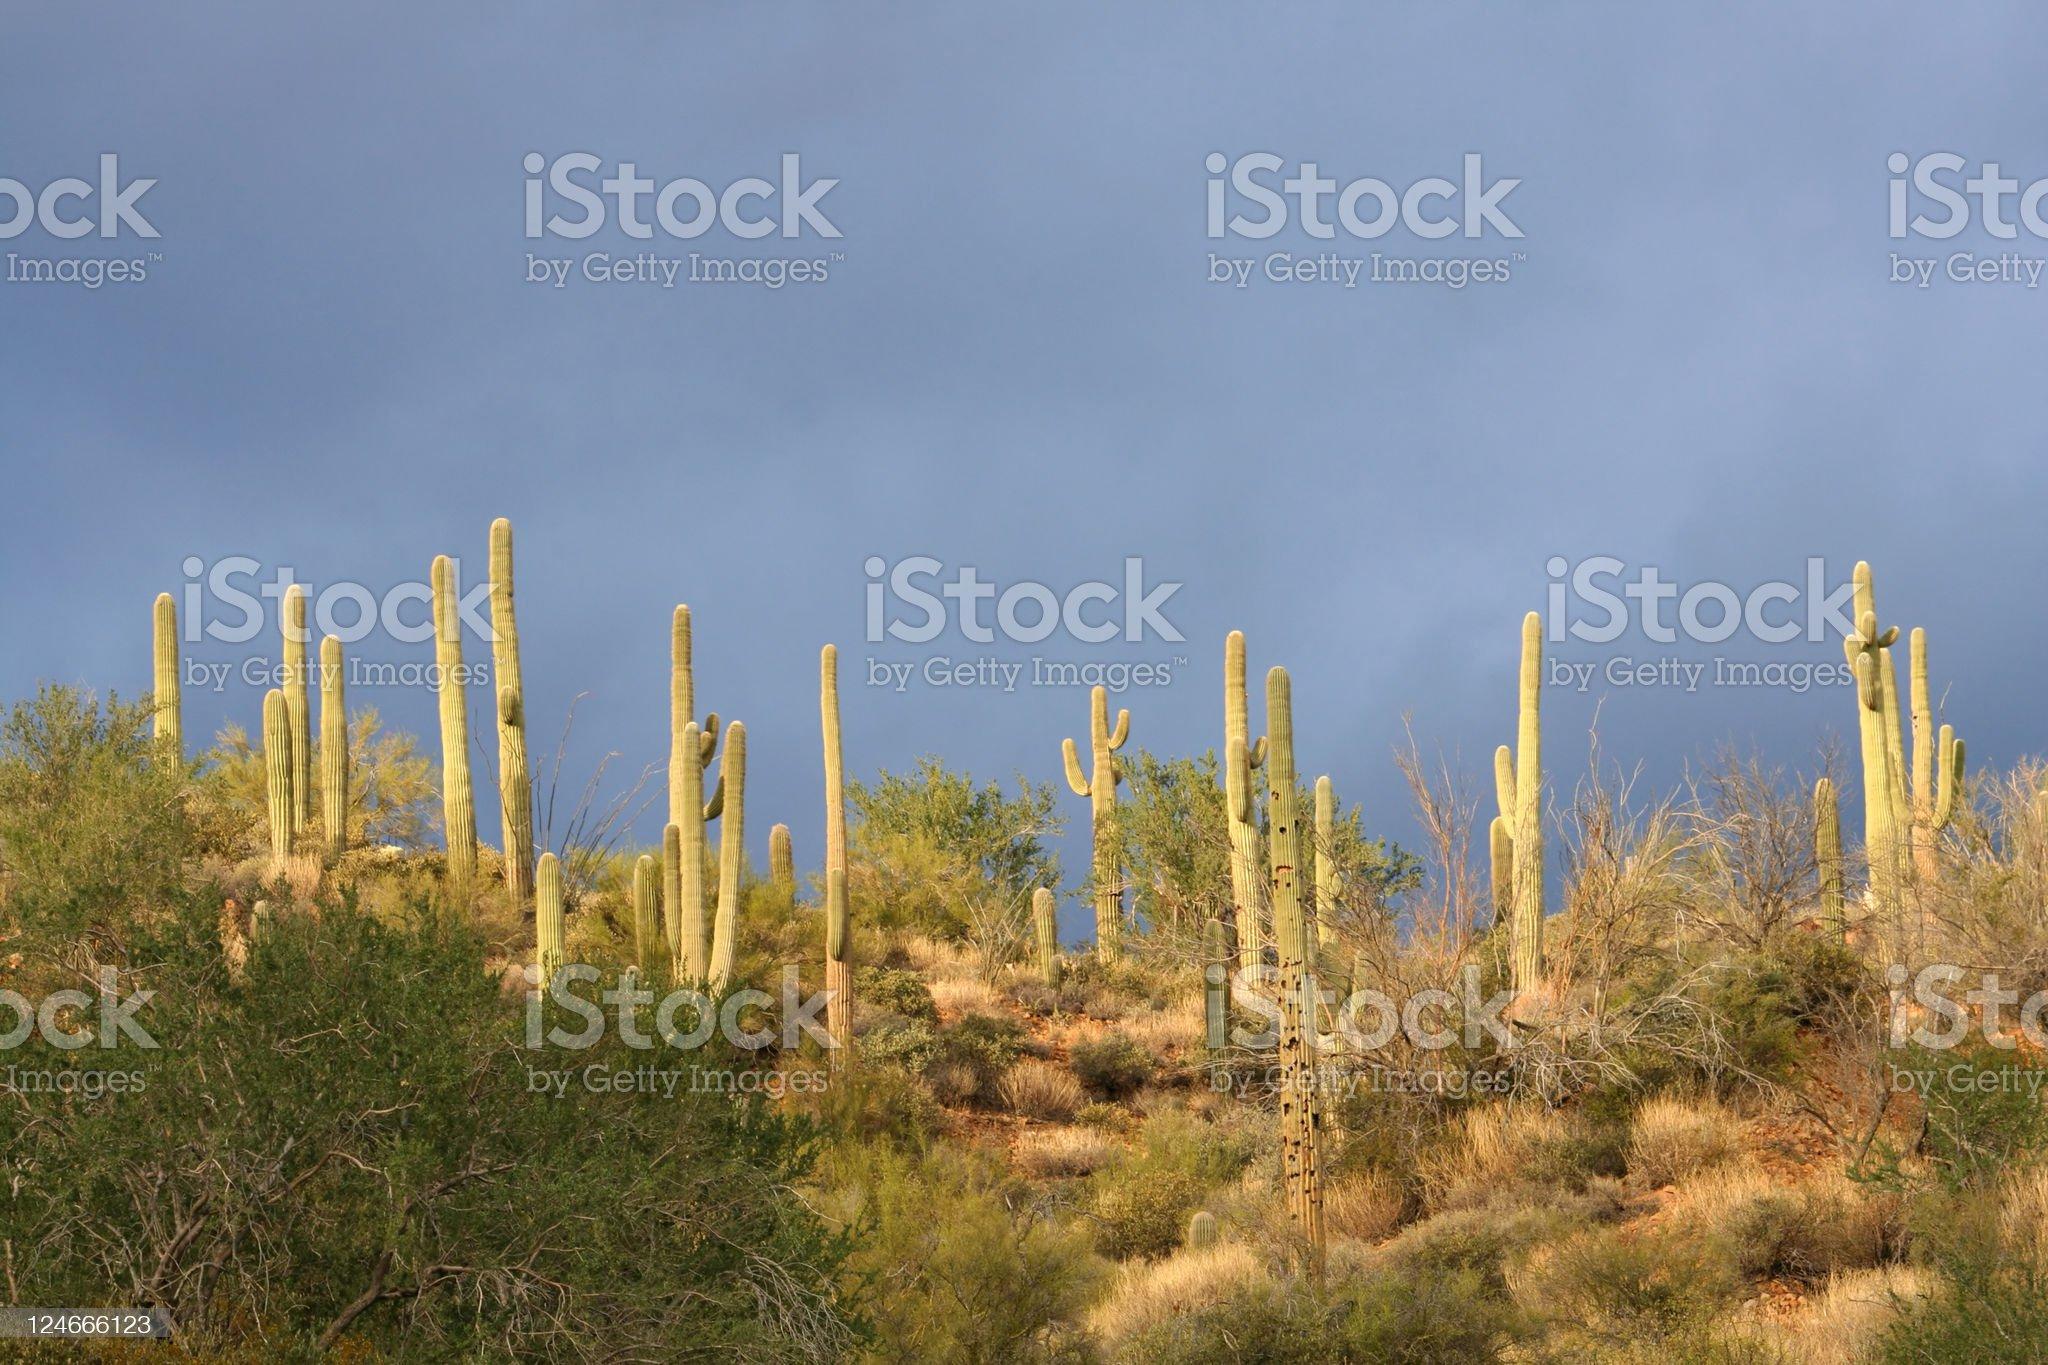 Saguaro Cactus and Stormy Sky royalty-free stock photo